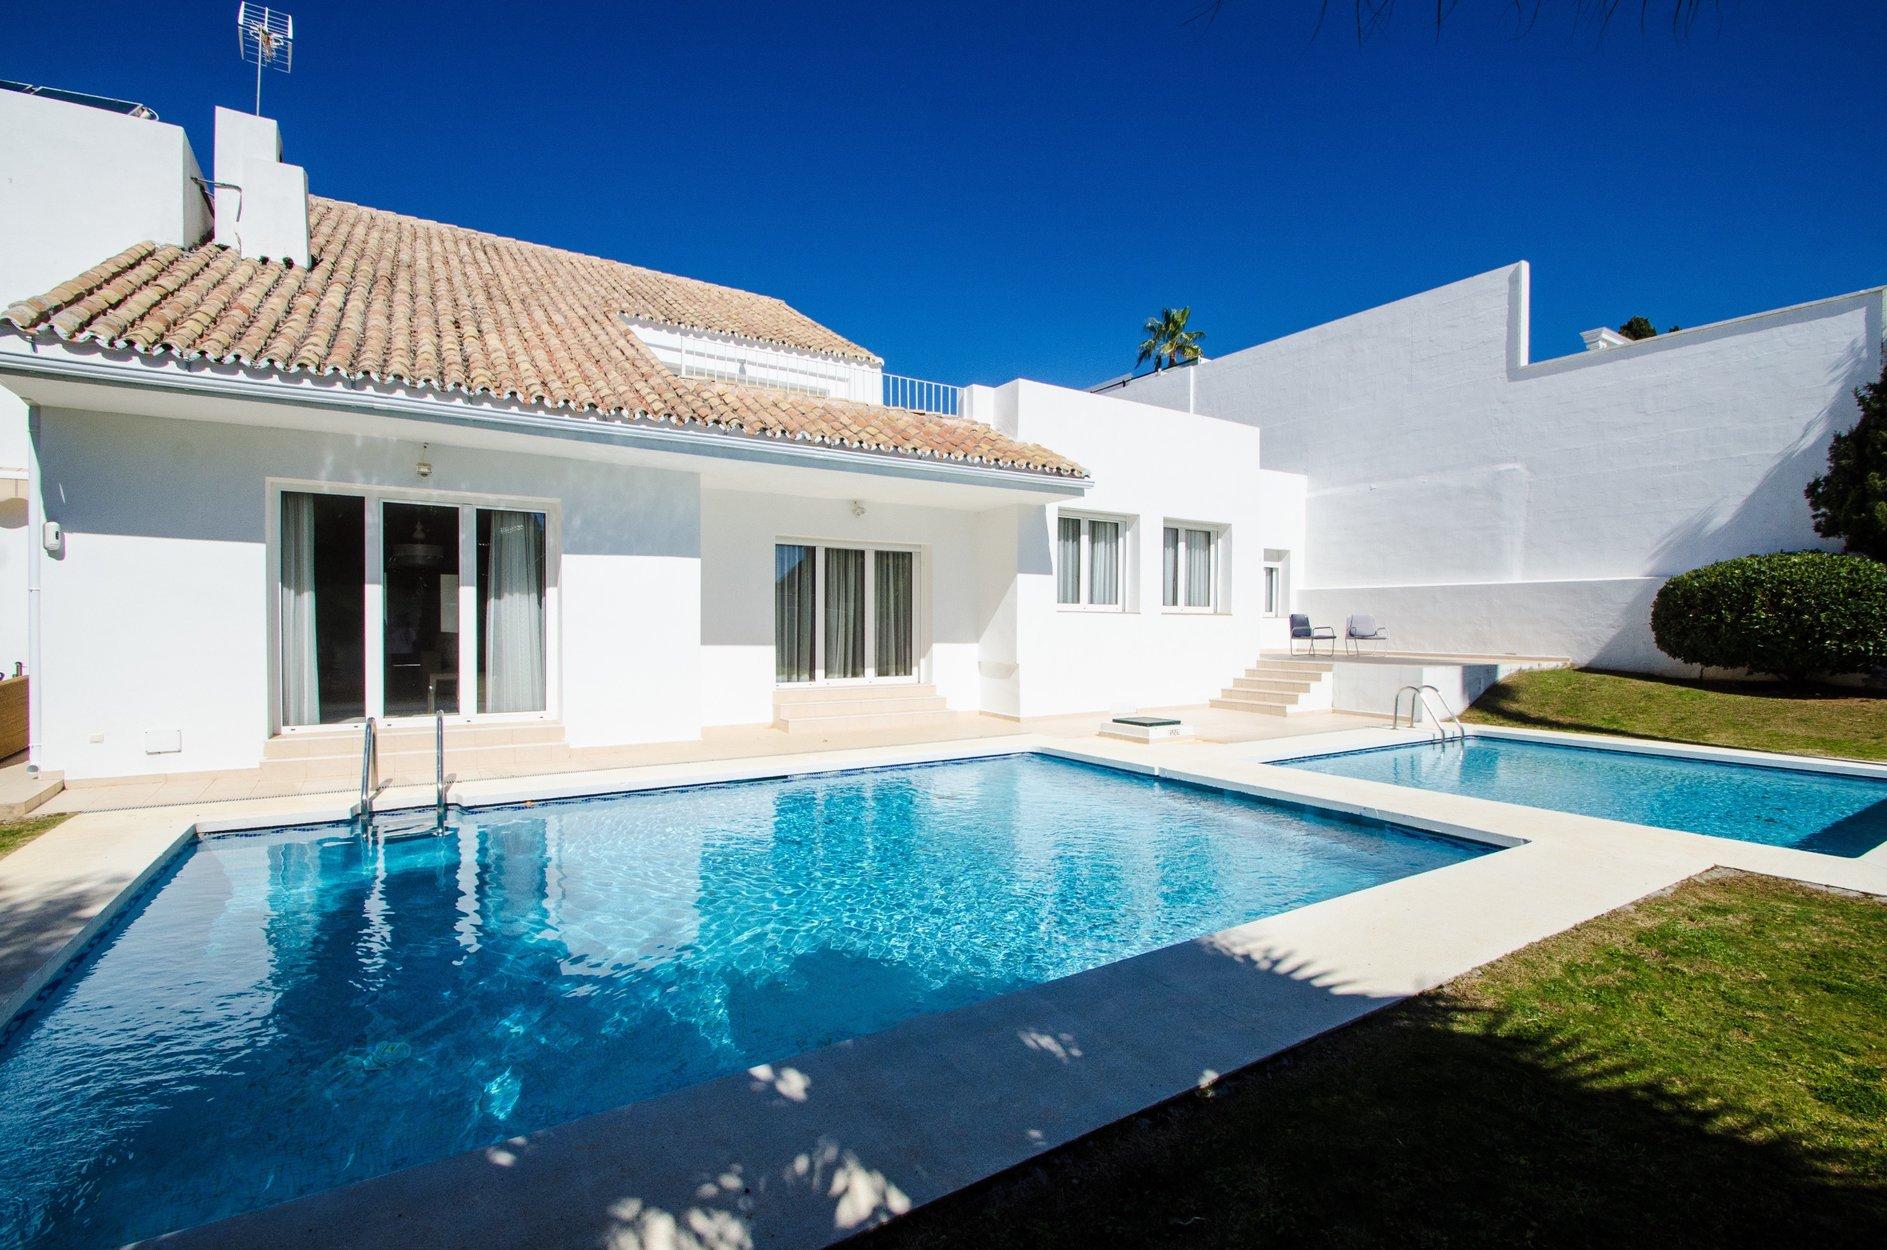 aaa7 Комнатный Дом в Puerto Banus, Marbella | M156600